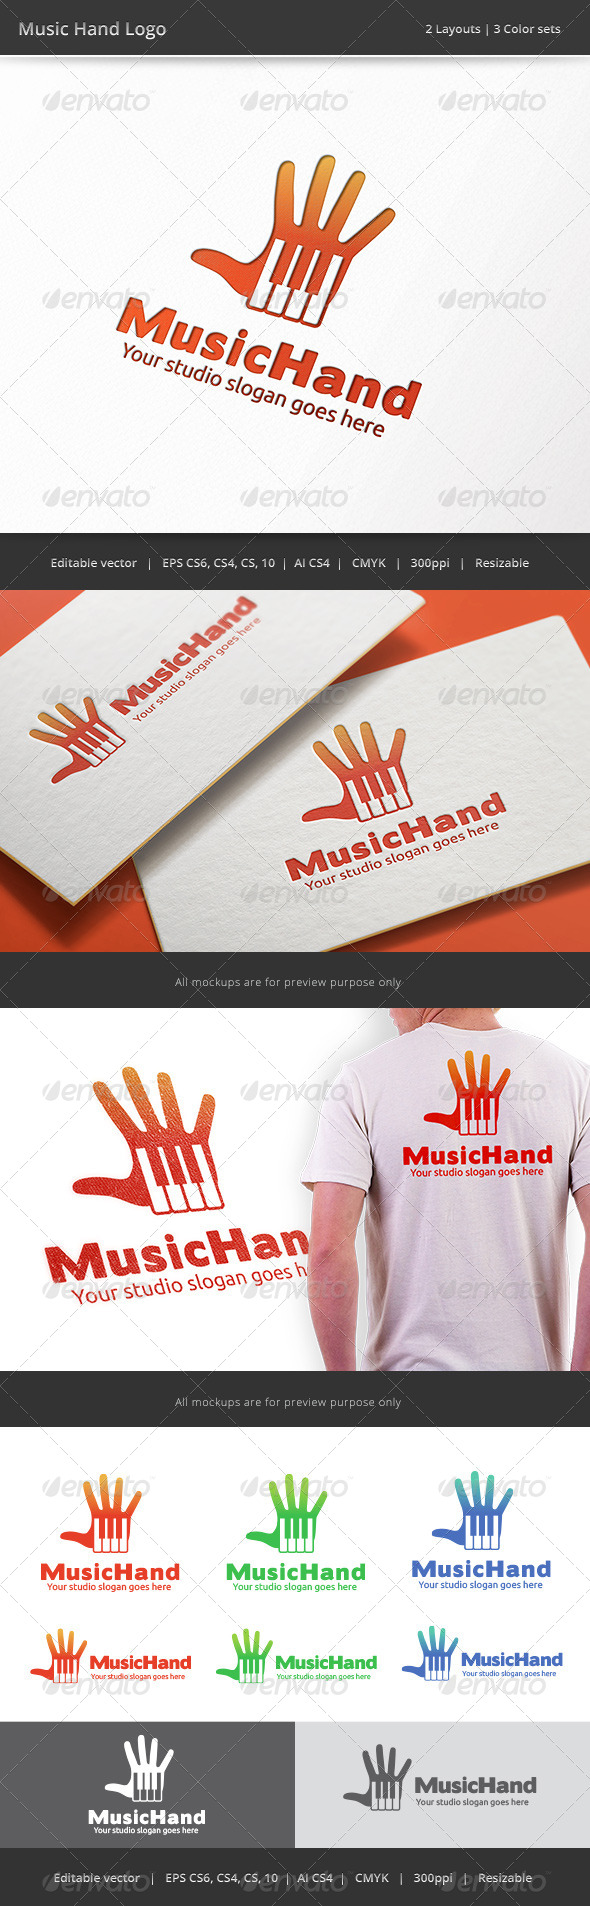 GraphicRiver Music Hand 8686944